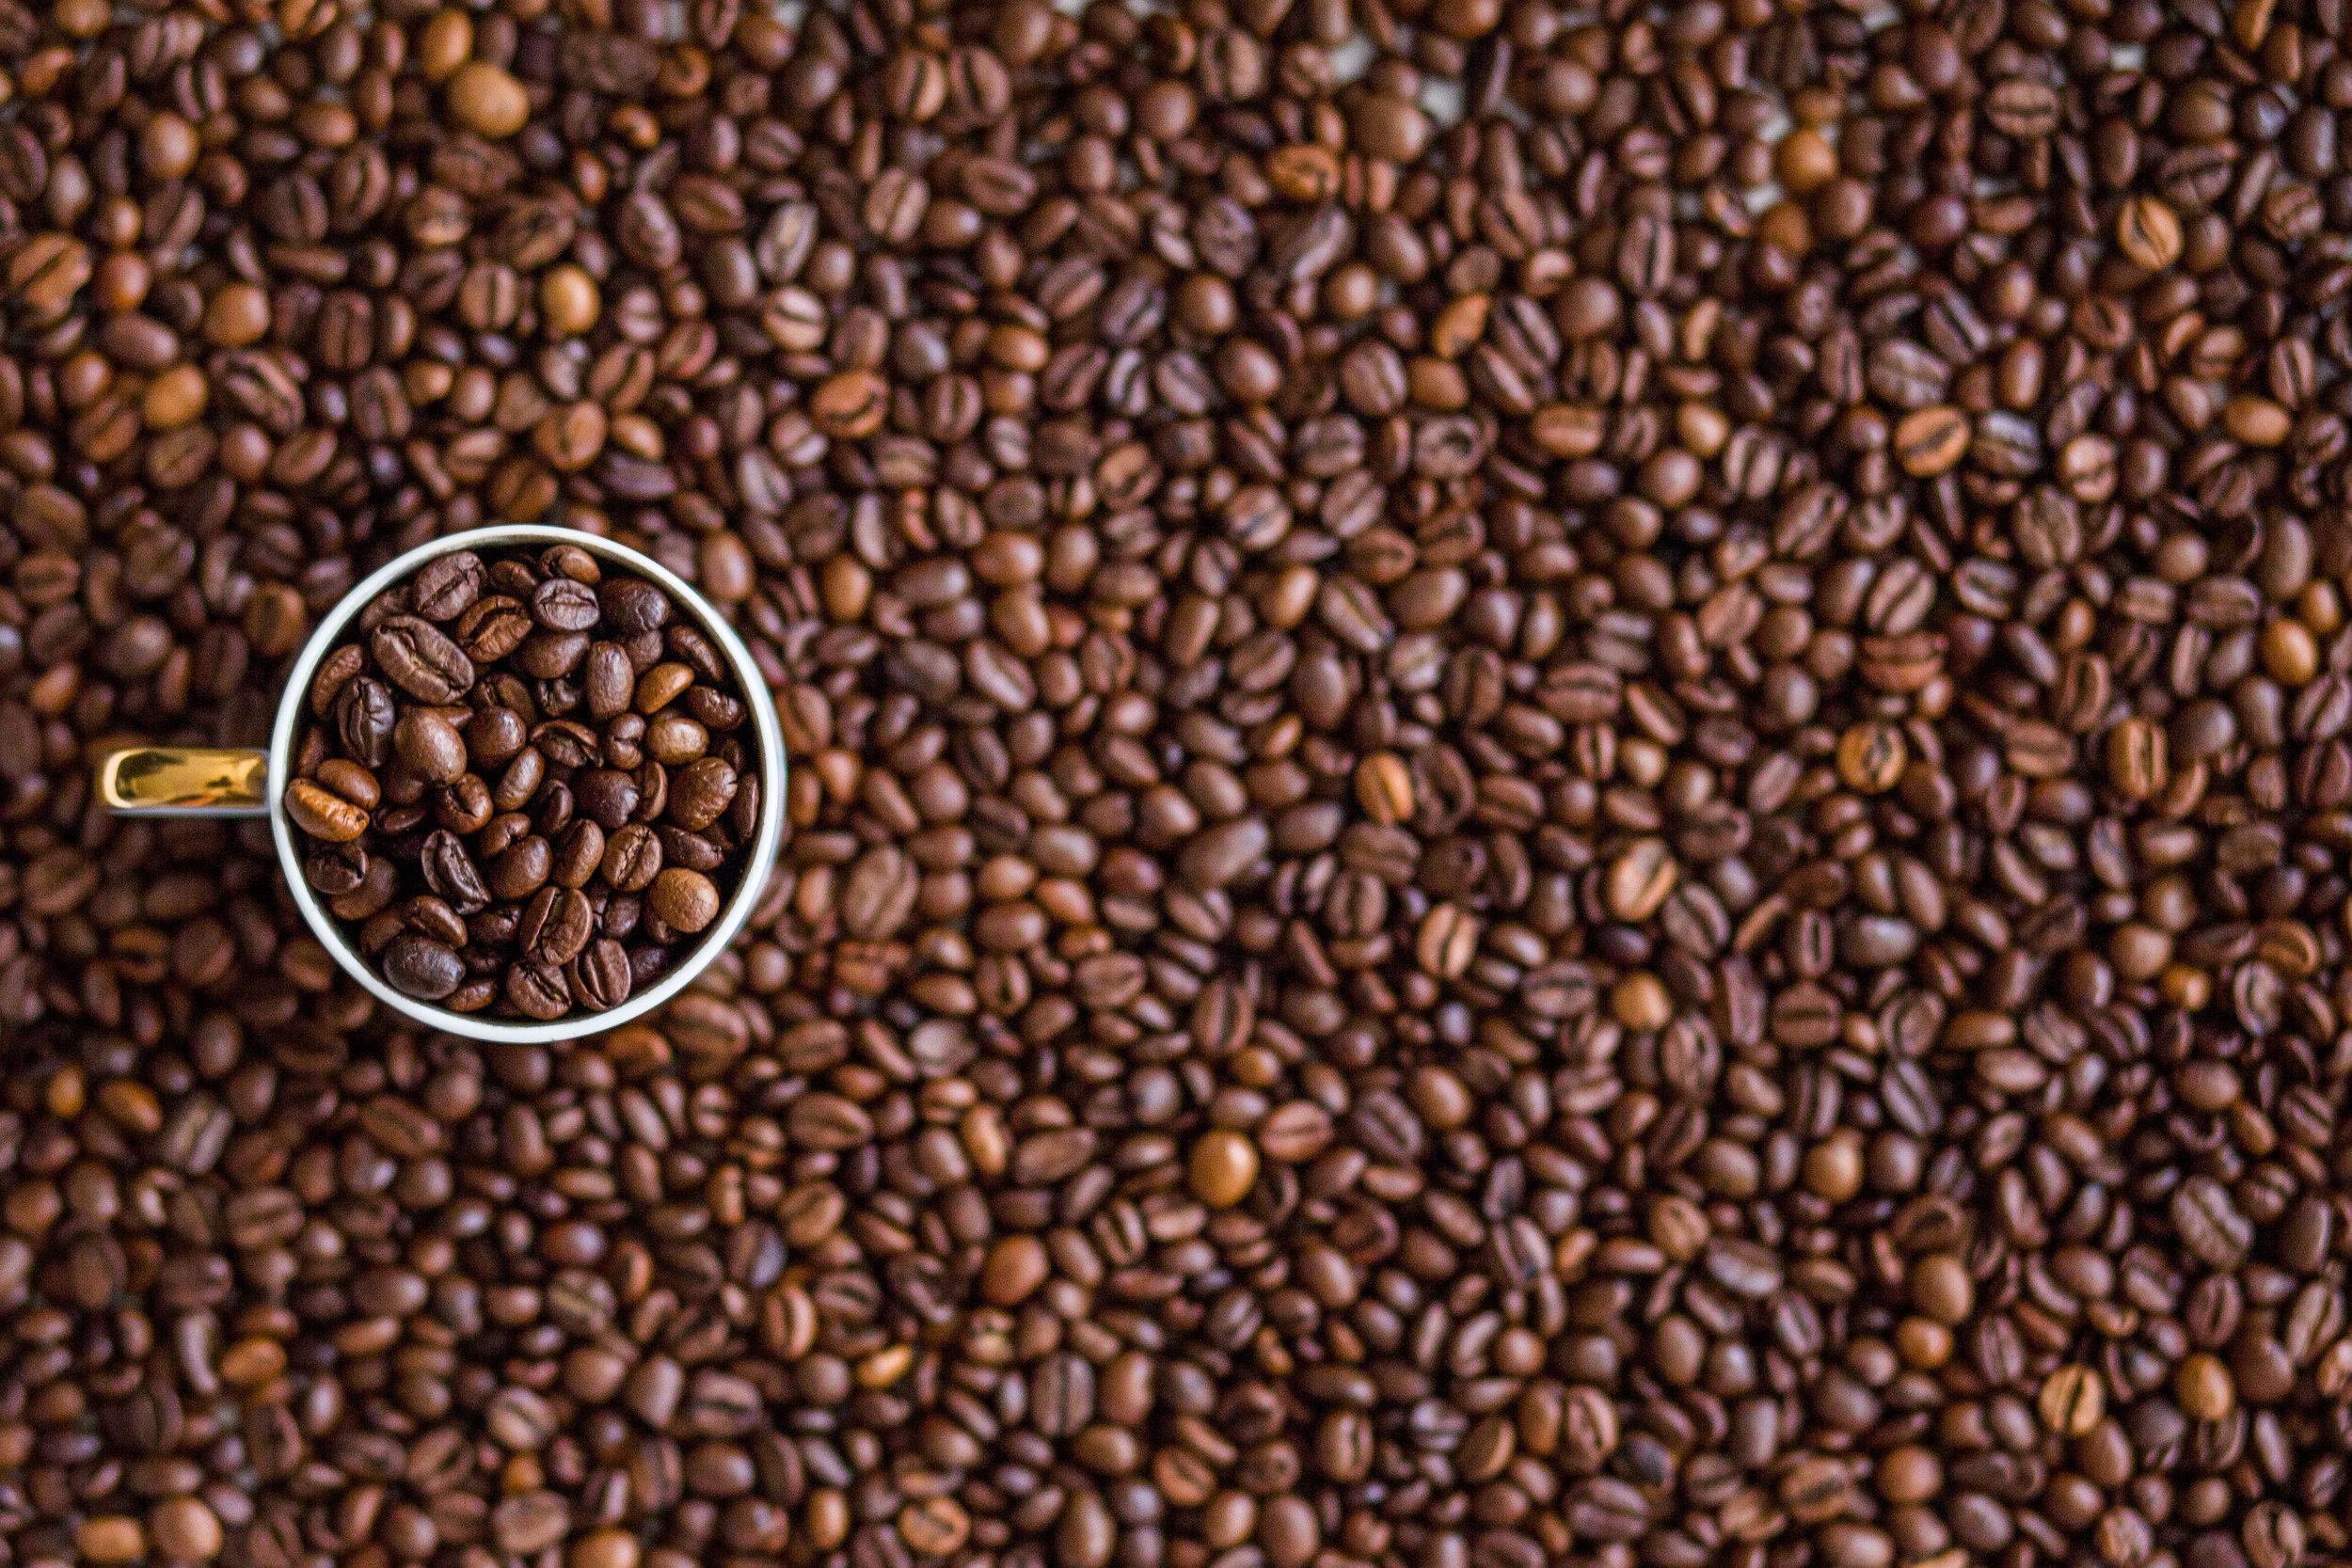 CoffeeBean.jpg